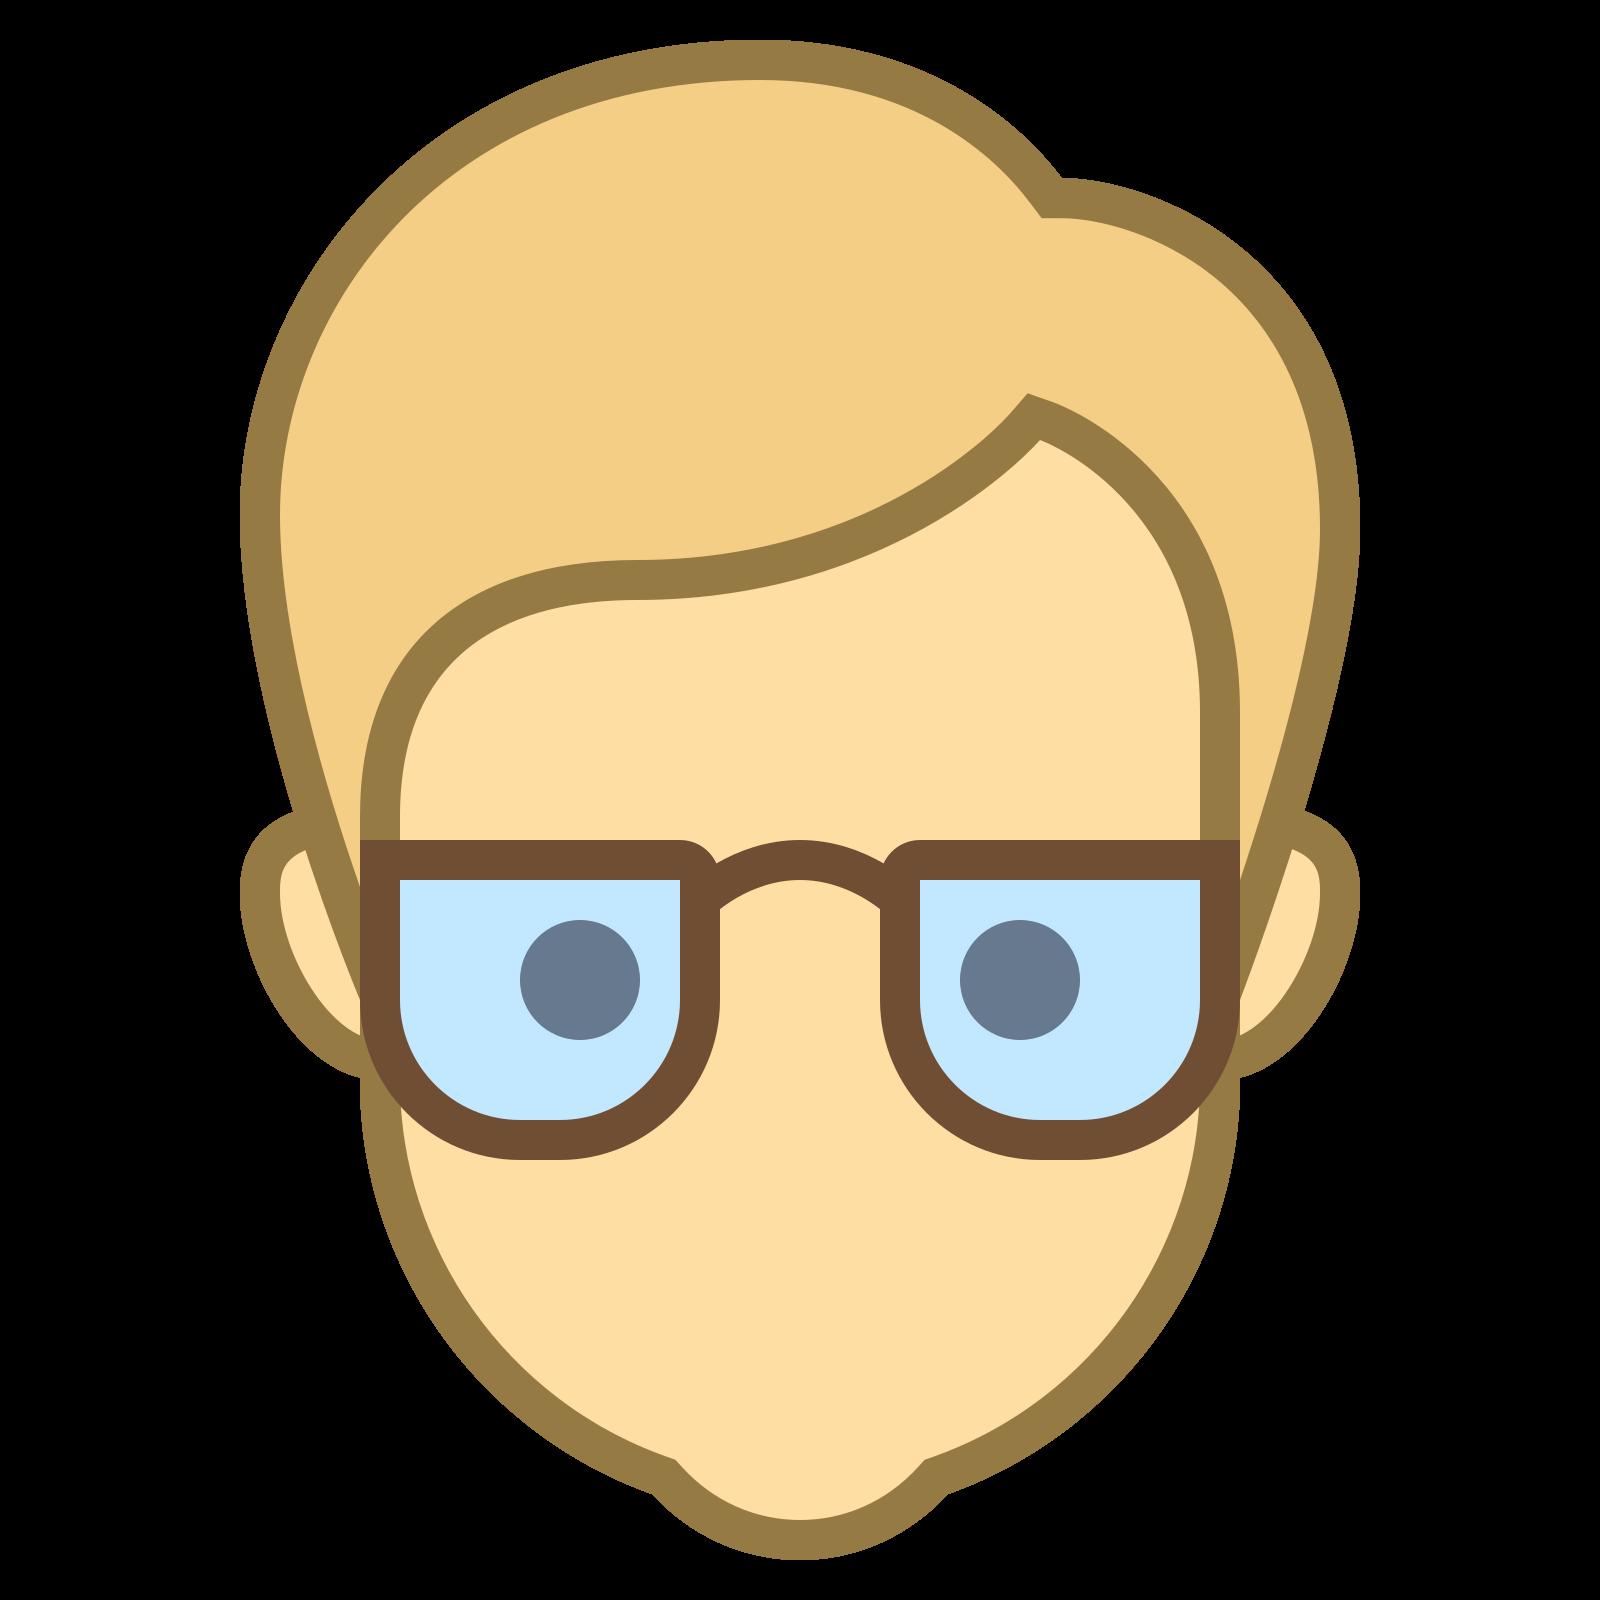 School Director Male Skin Type 3 icon